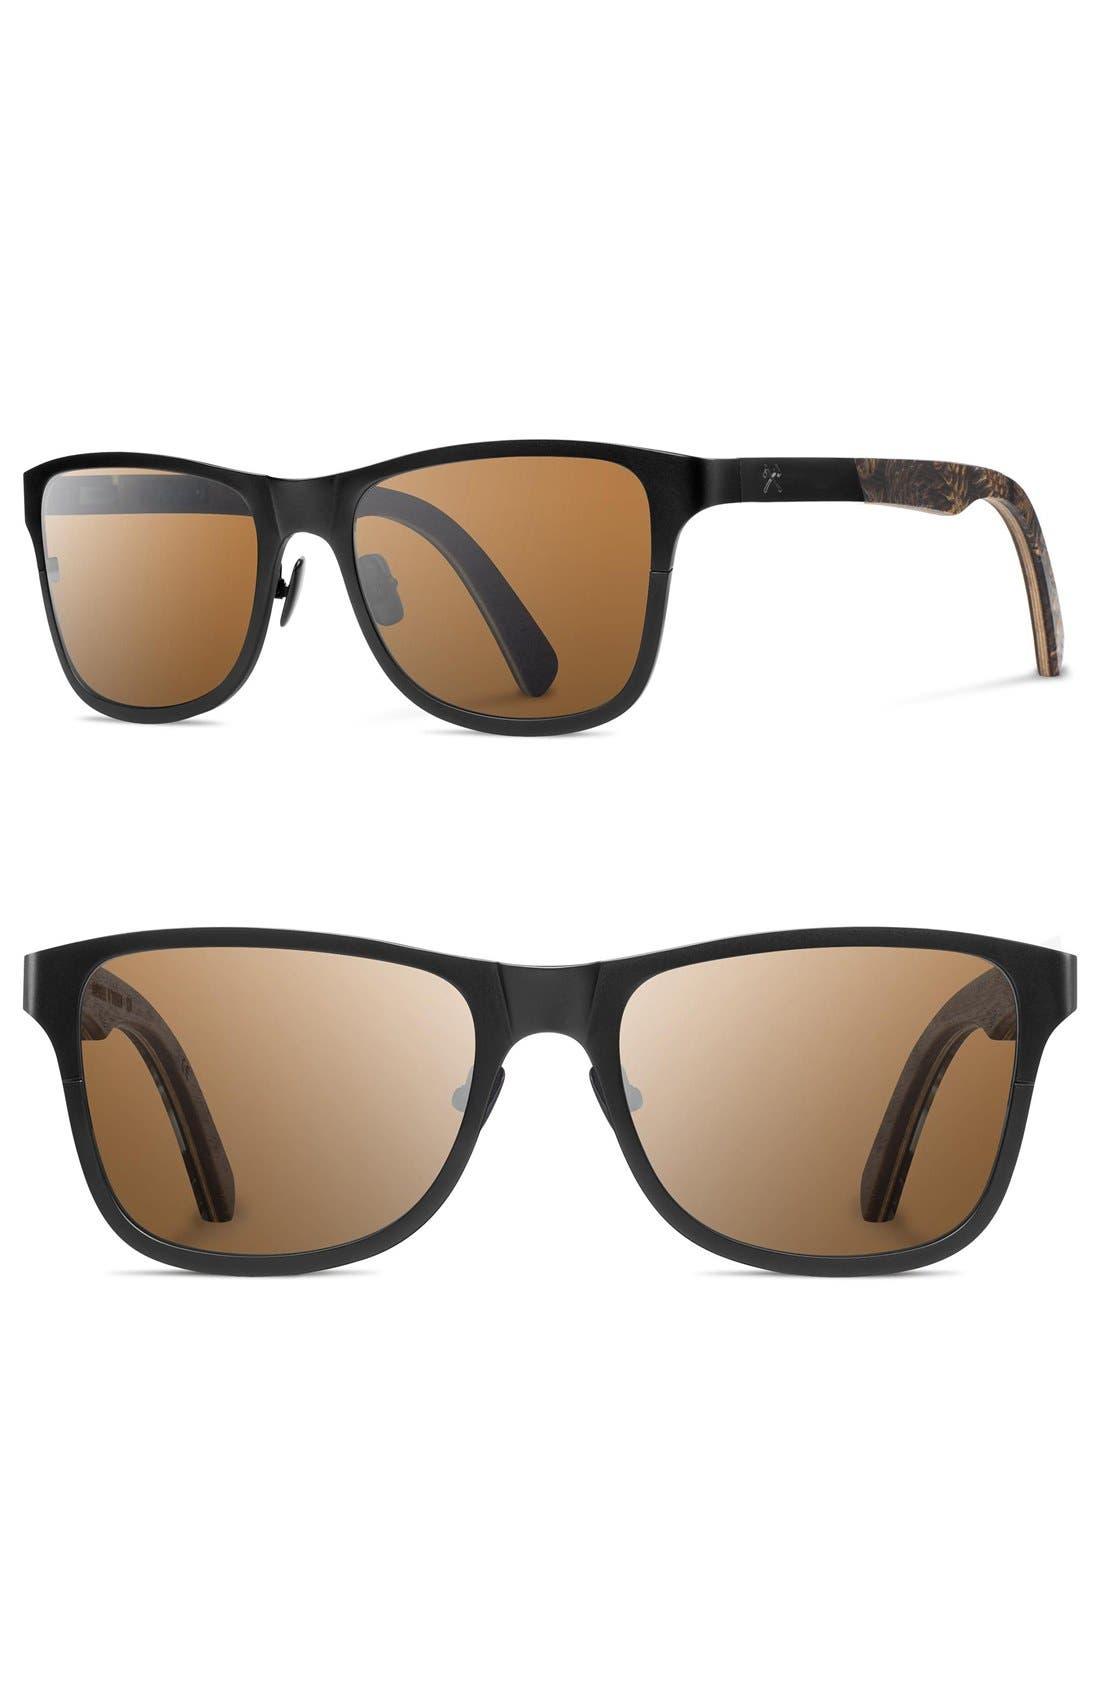 Main Image - Shwood Canby 54mm Polarized Pine Cone & Titanium Sunglasses